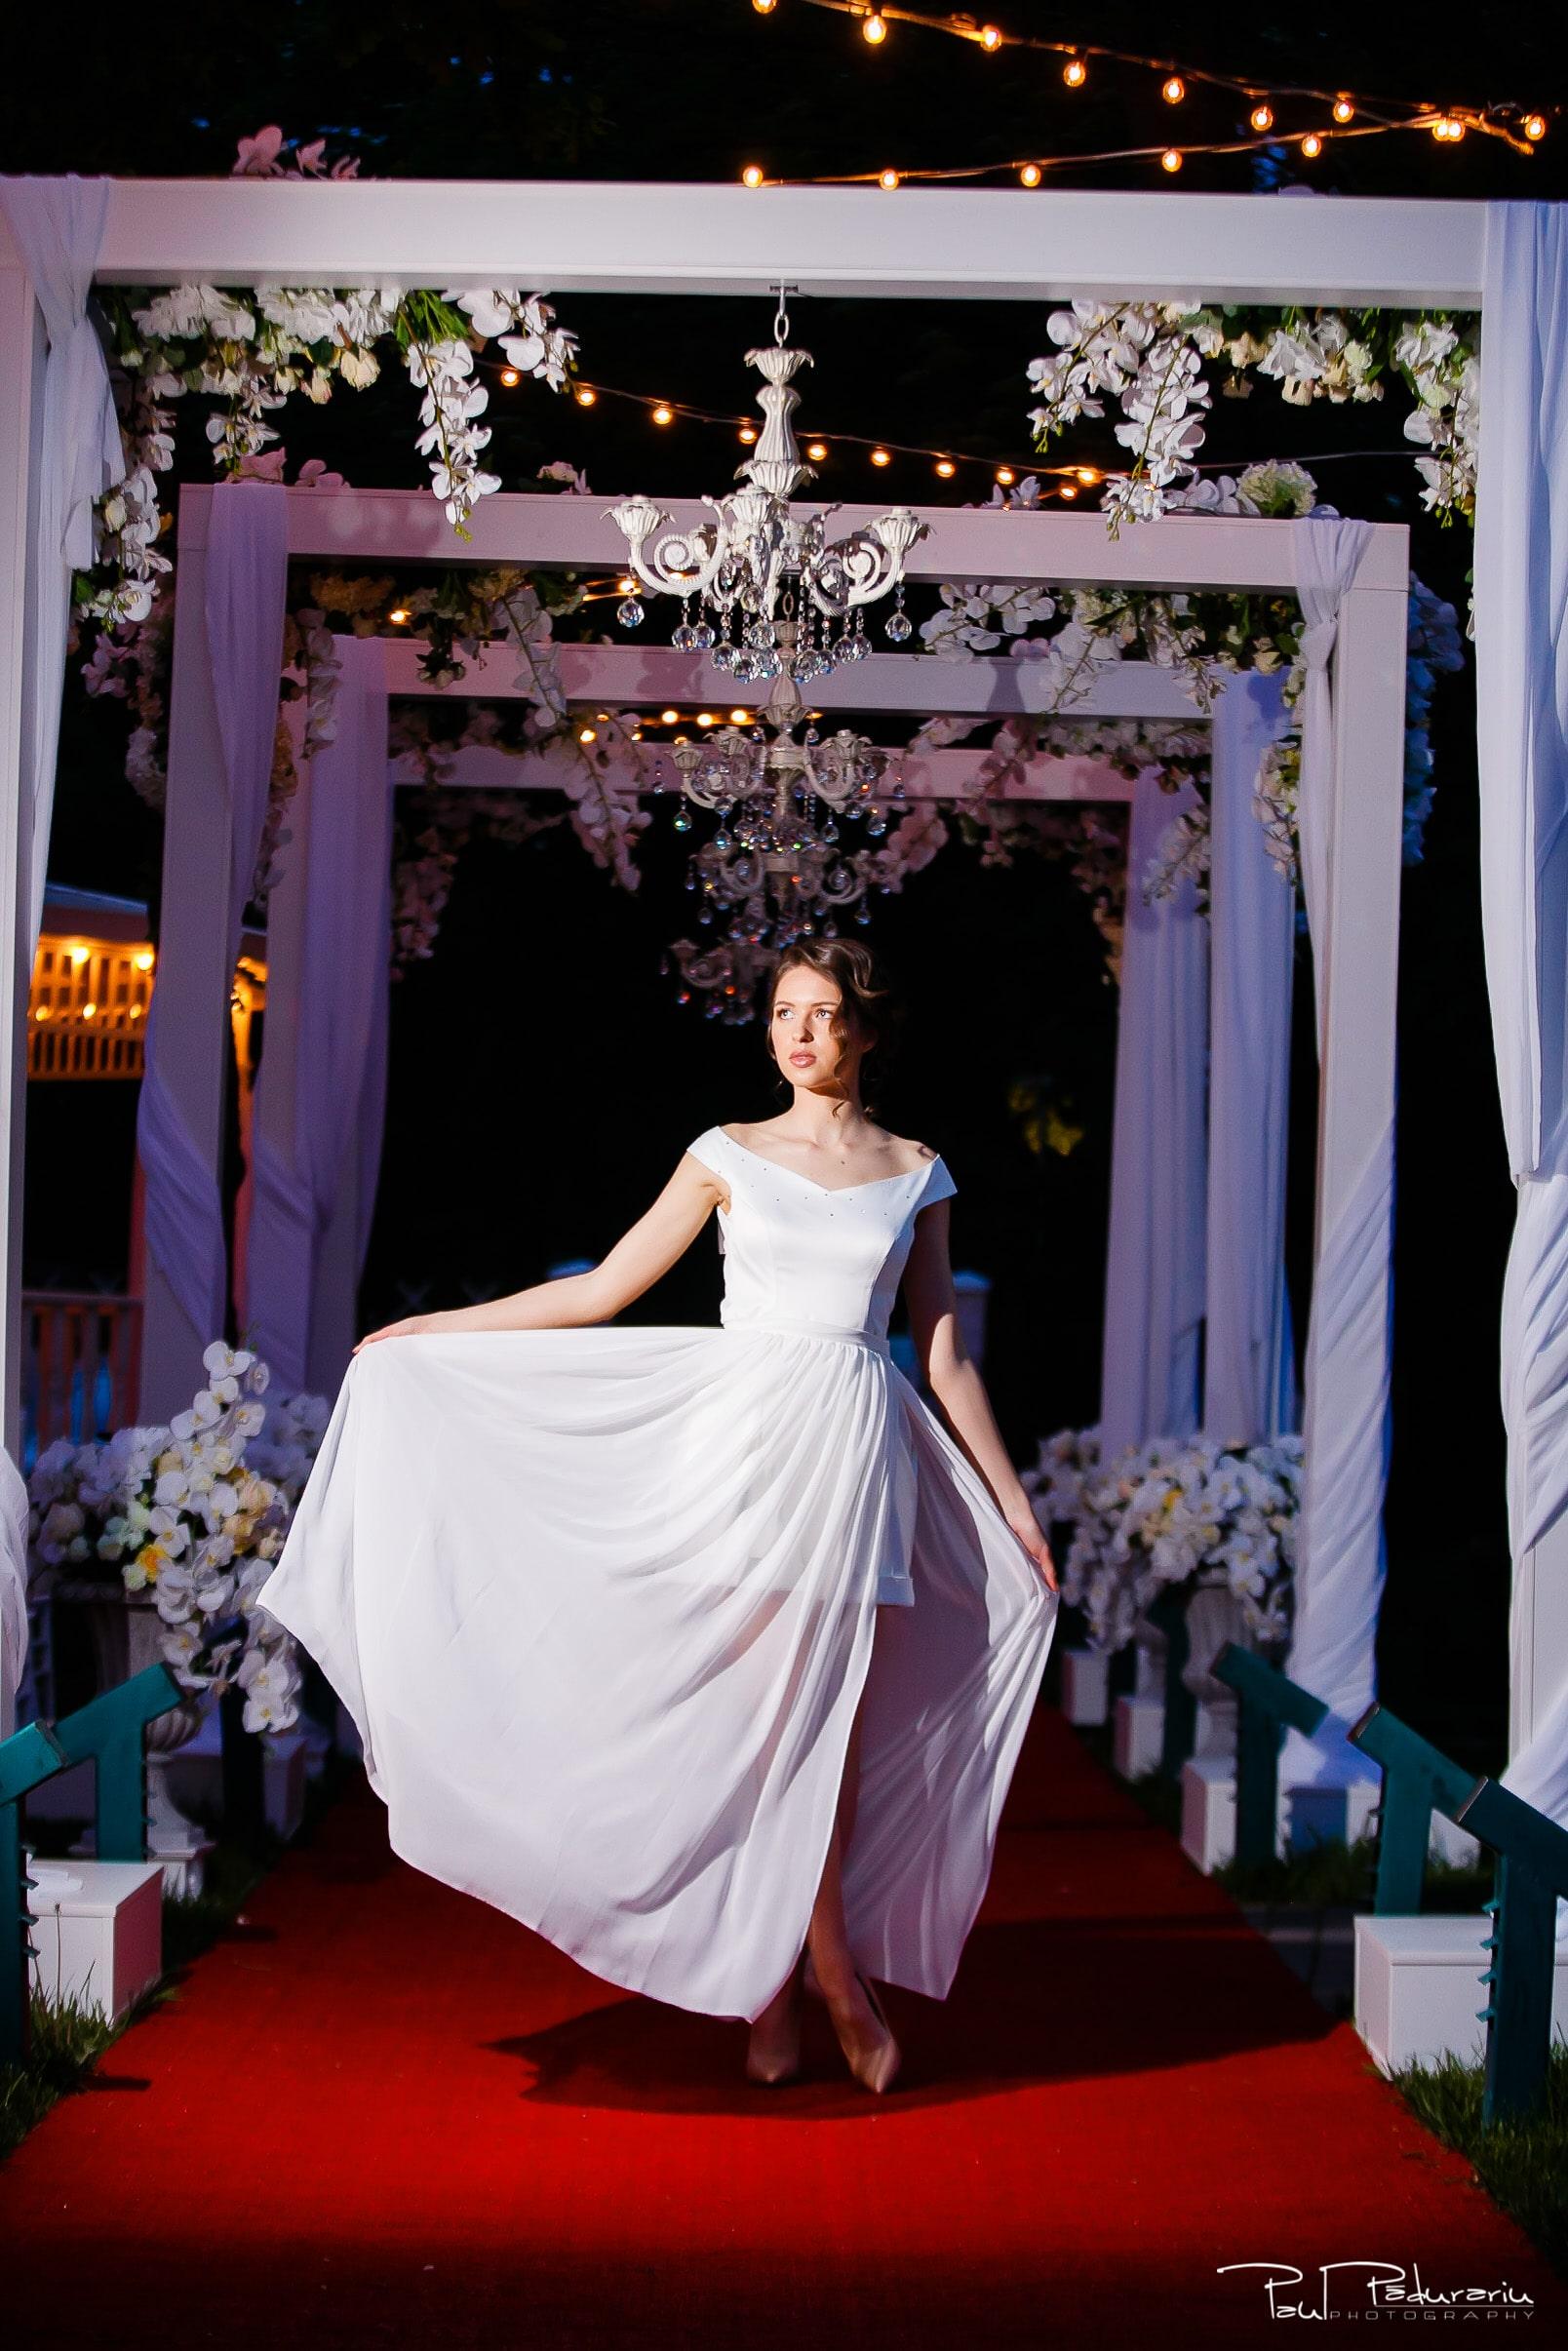 Modern Bride Edith Val colectie rochie mireasa 2019 - fotograf profesionist iasi paul padurariu | nunta iasi 16